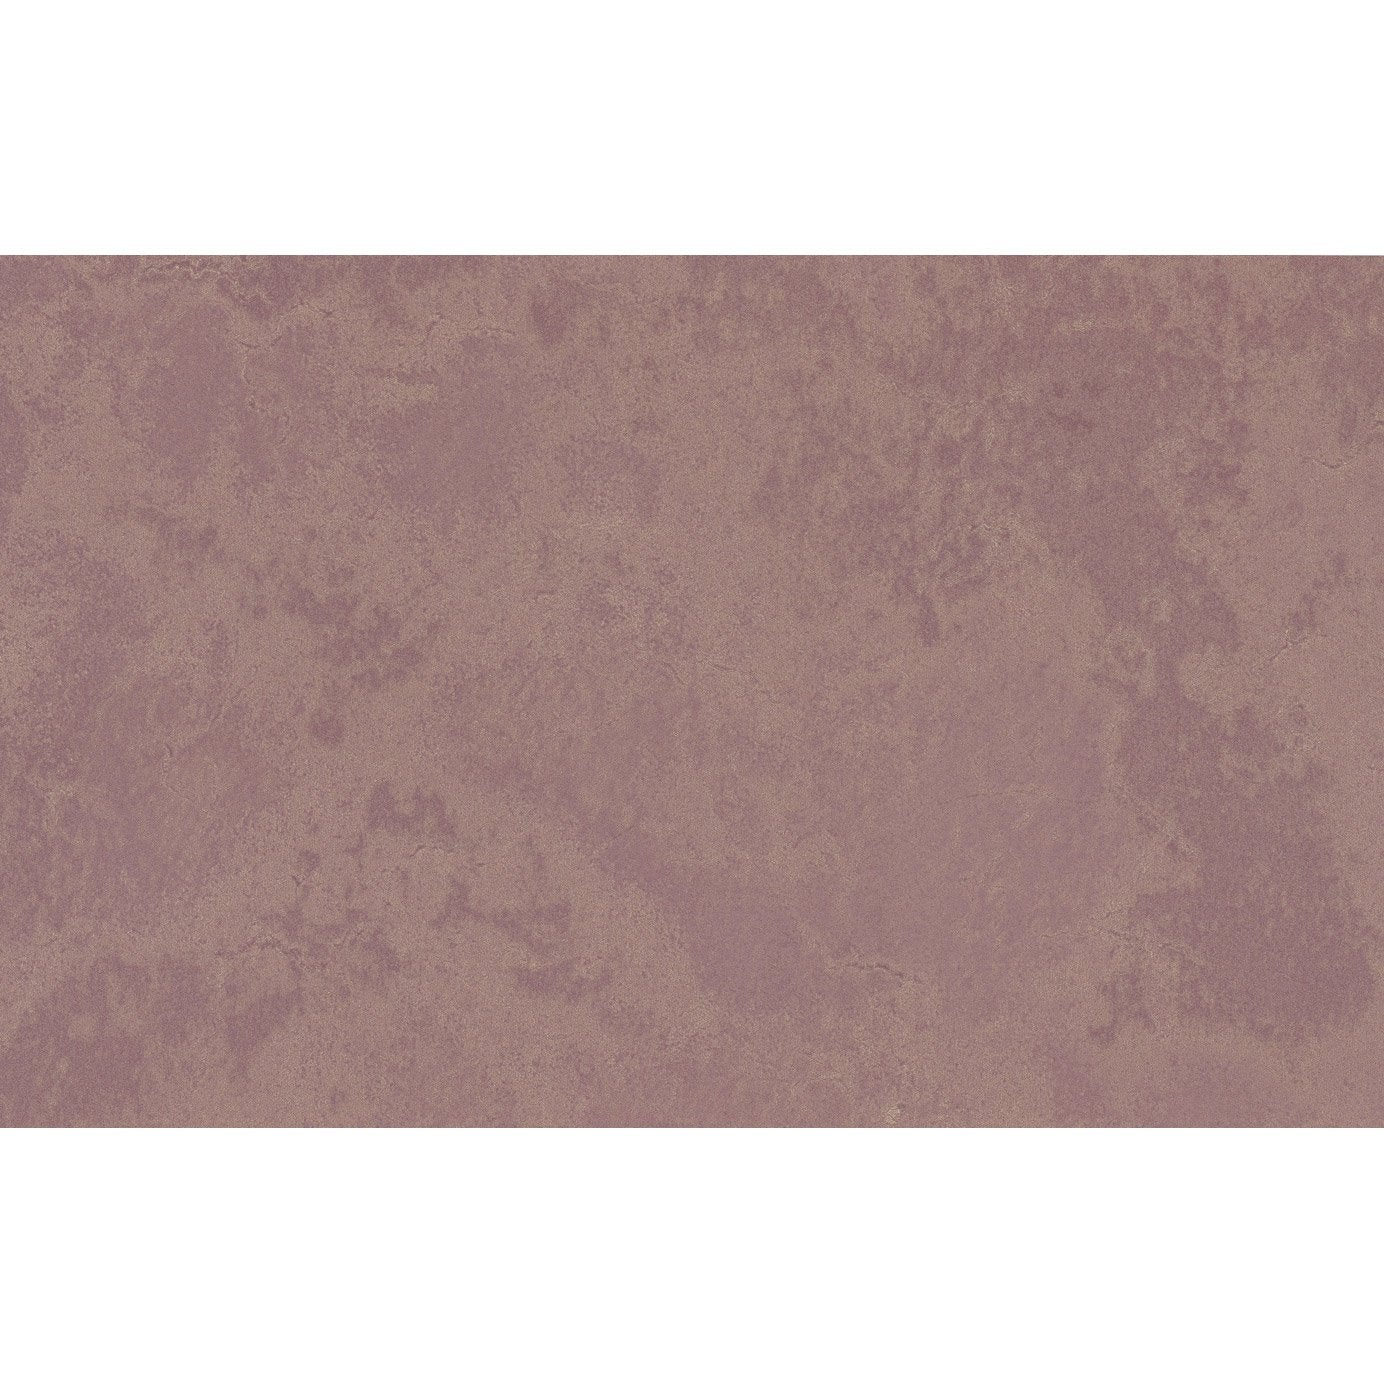 papier peint rose papier italian color leroy merlin. Black Bedroom Furniture Sets. Home Design Ideas